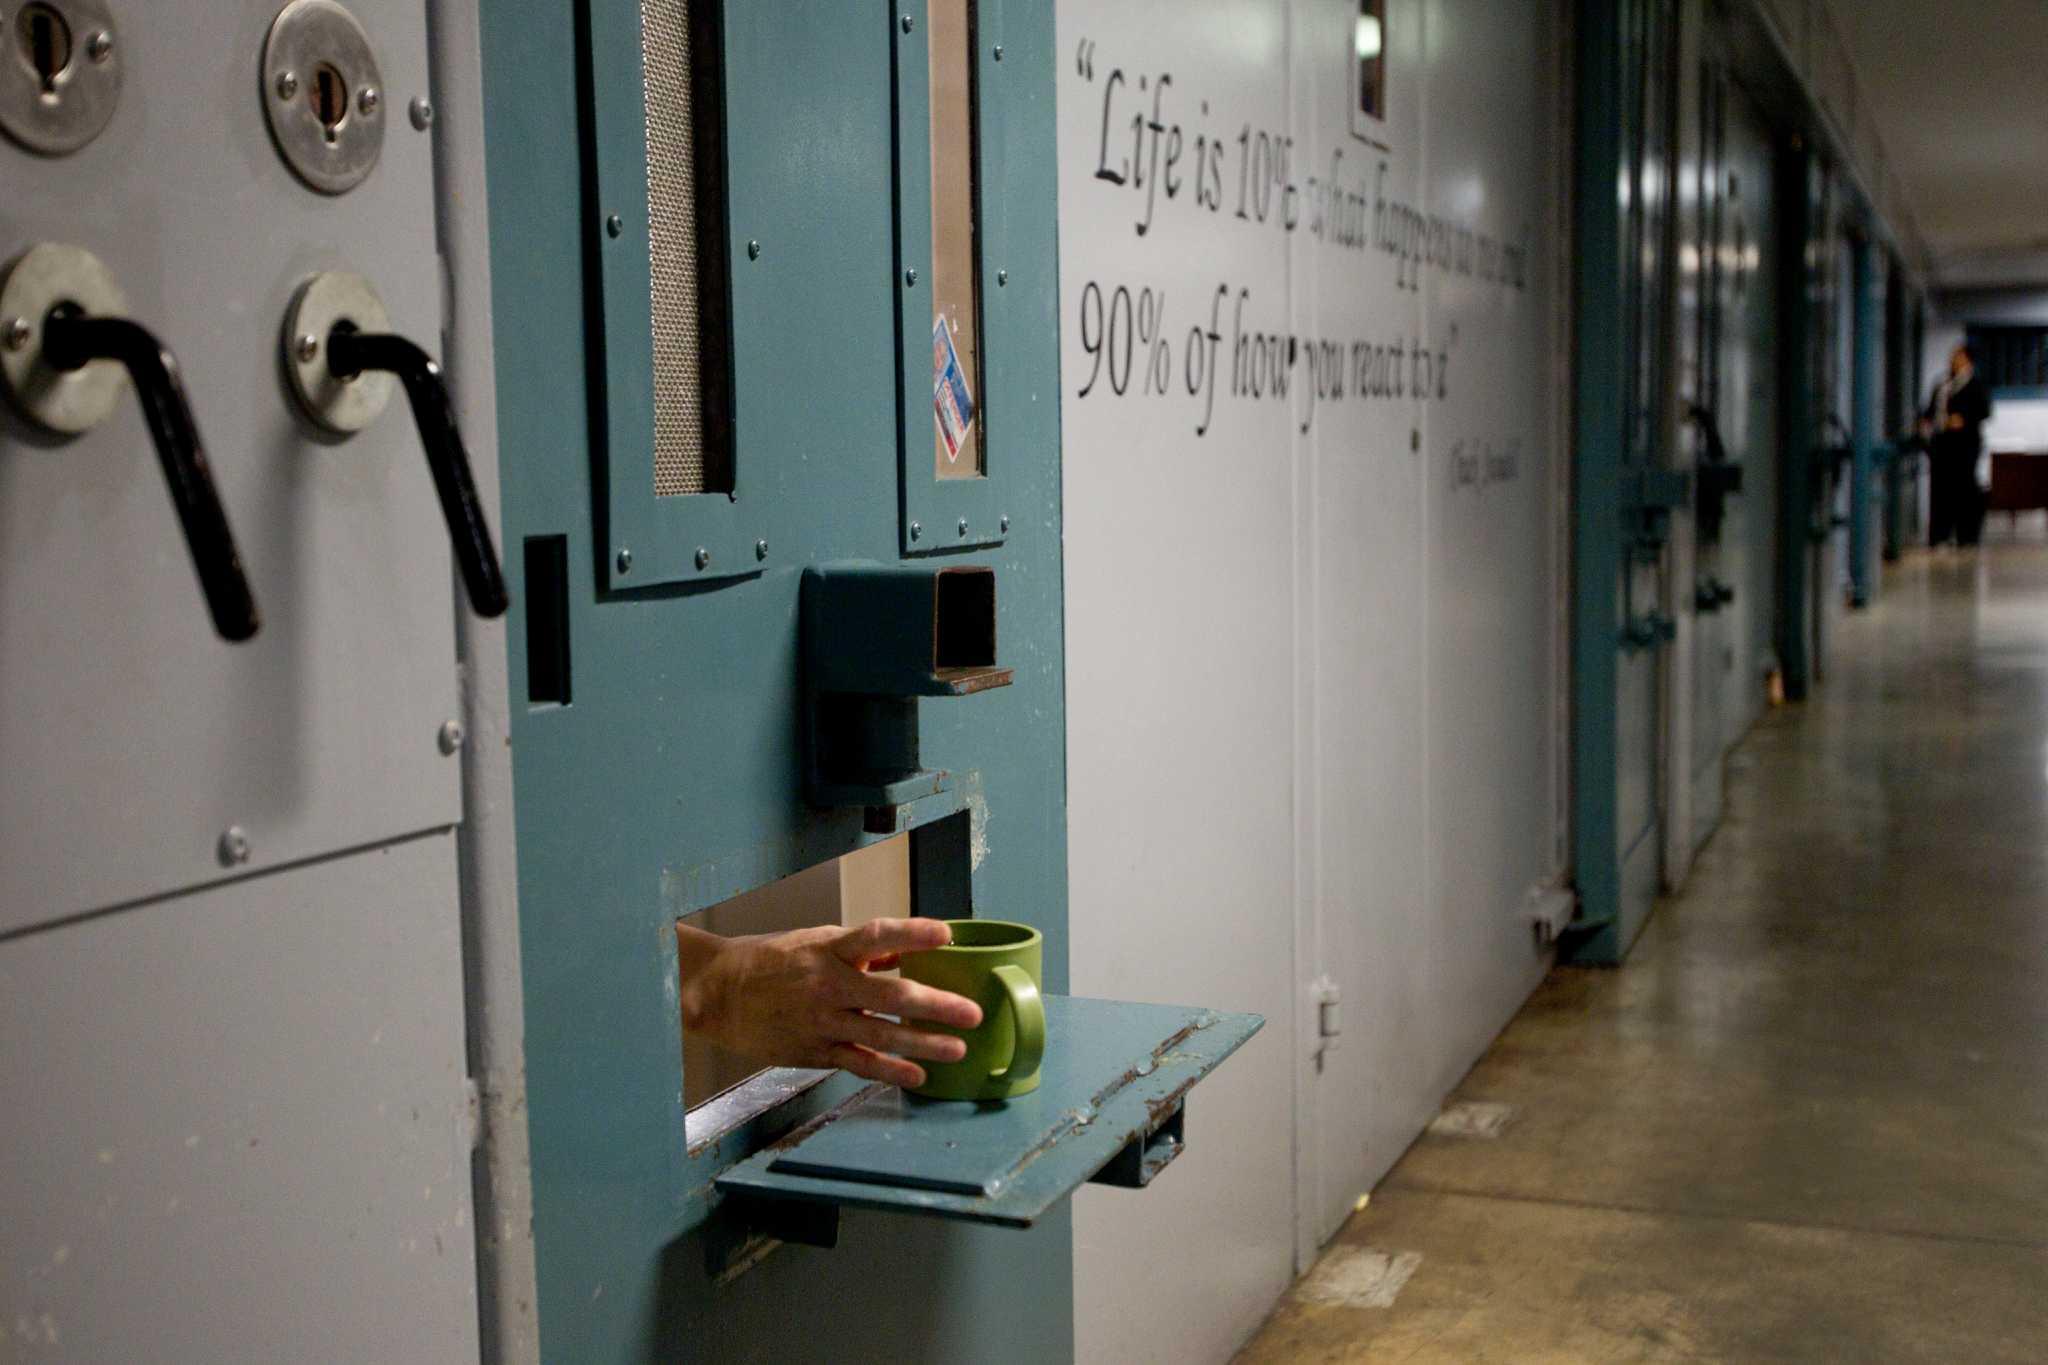 TDCJ to consider layoffs, prison closures to offset budget